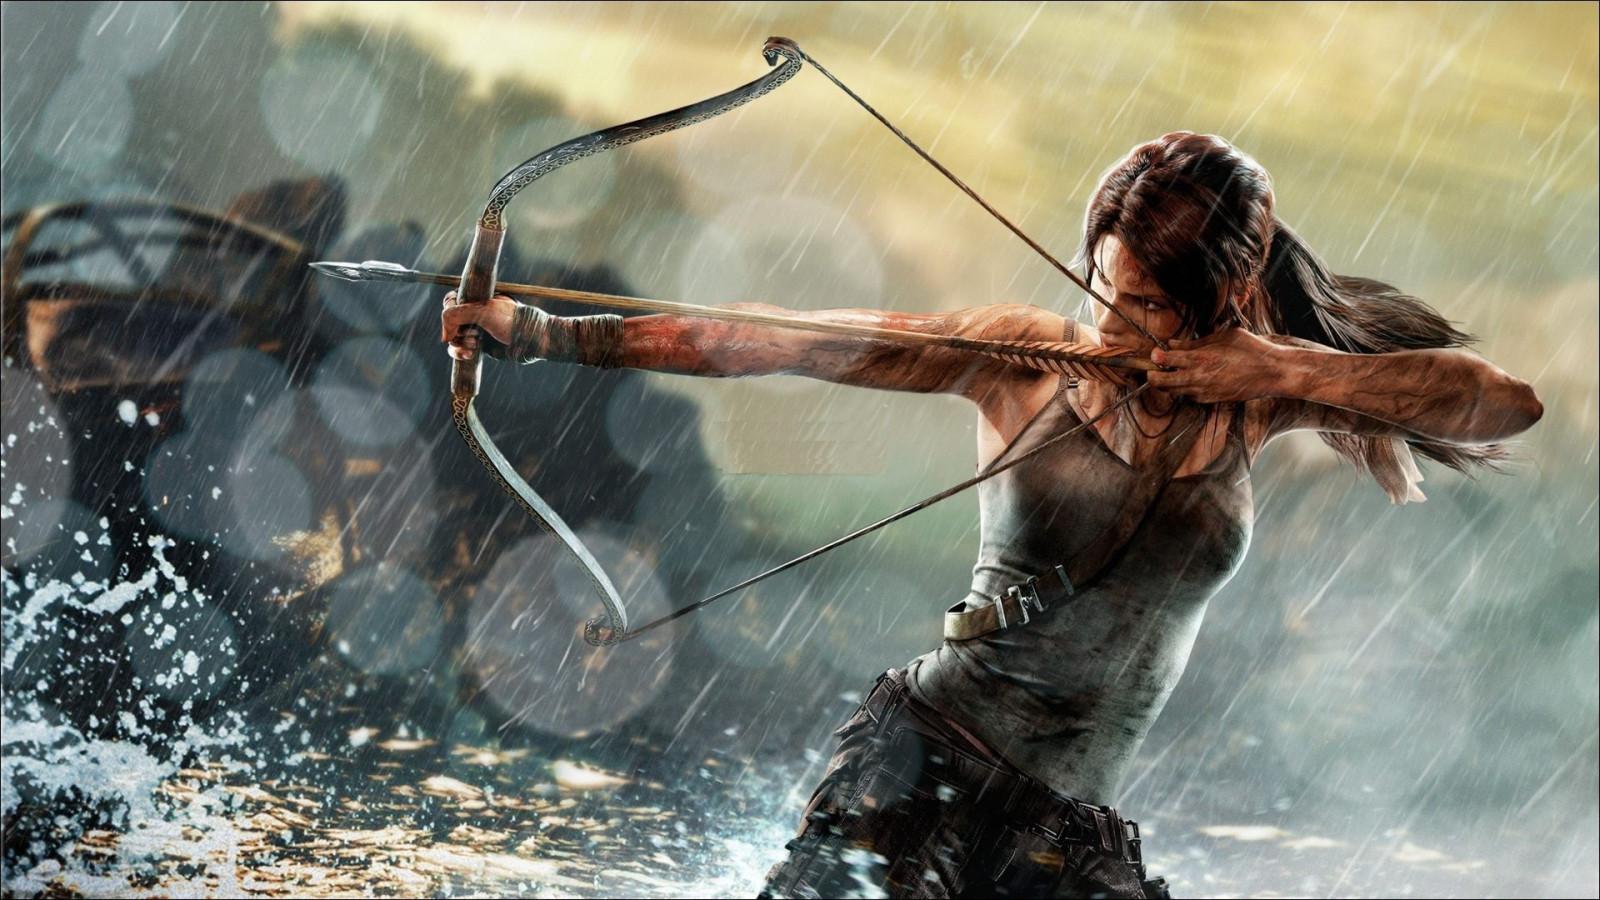 Wallpaper : 1920x1080 px, archers, bows, Lara Croft, Rise ...